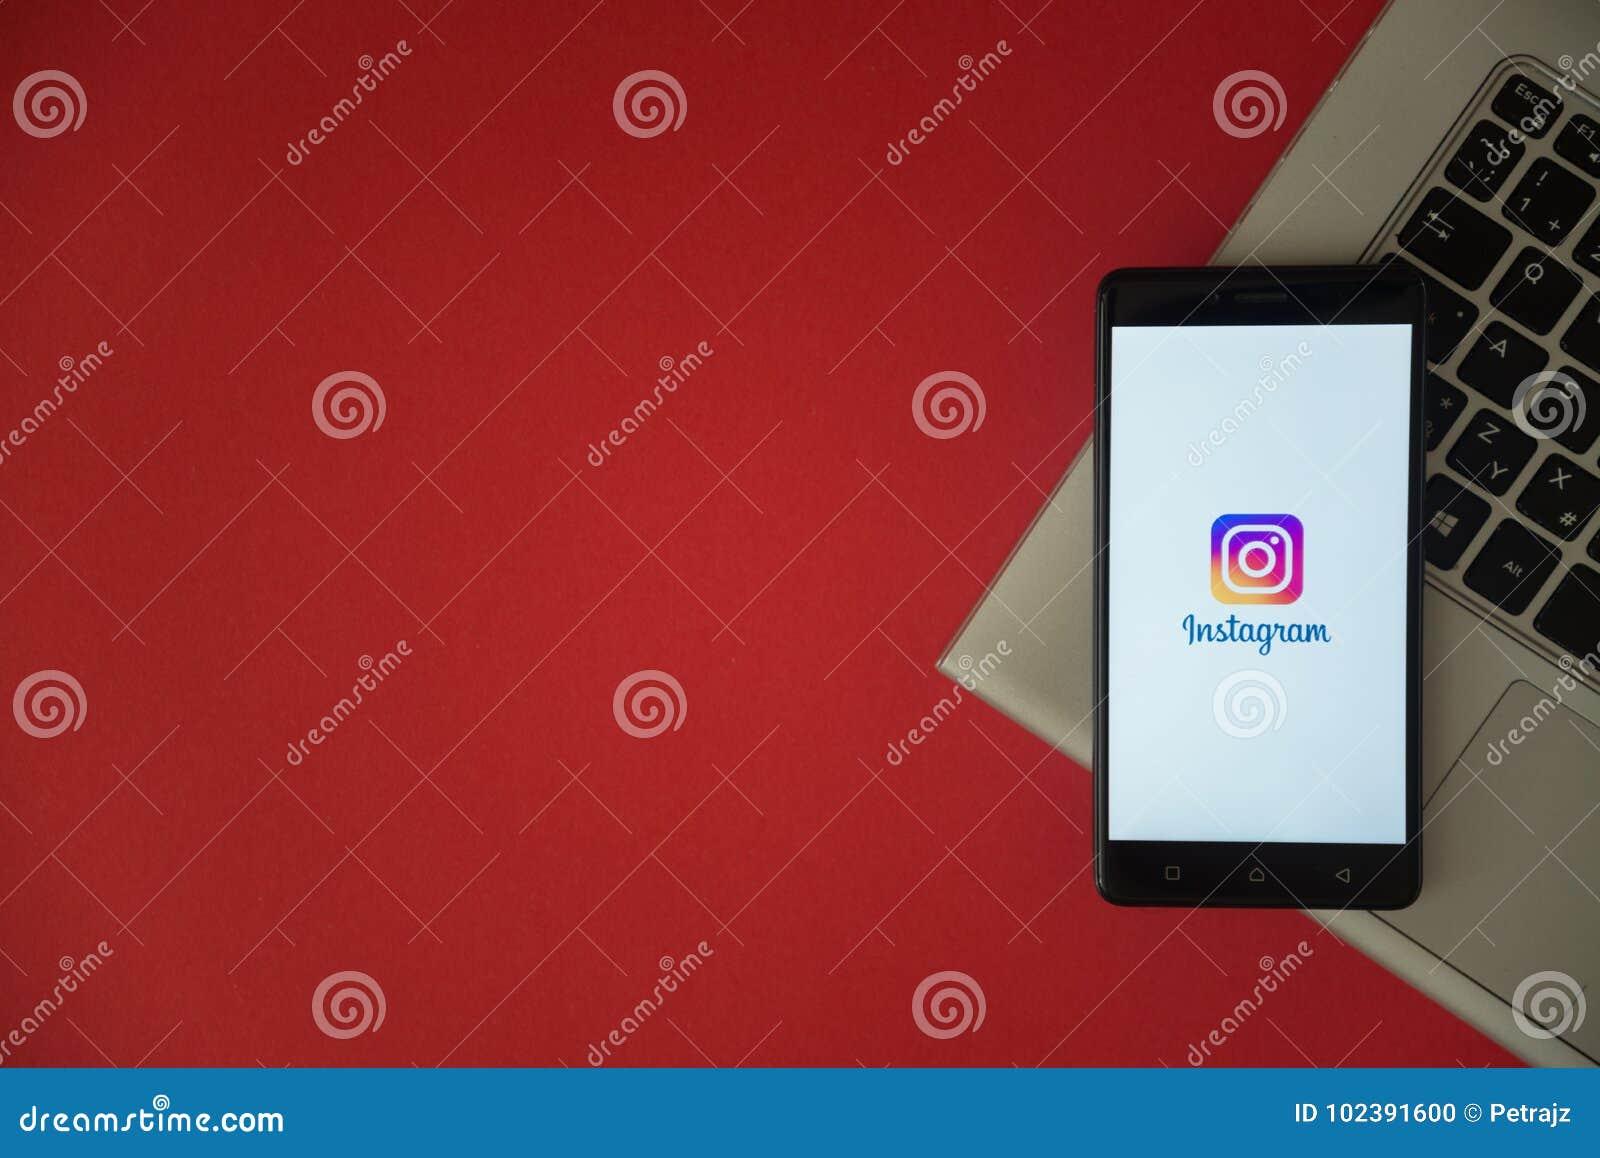 Instagram Logo On Smartphone Screen Placed On Laptop Keyboard